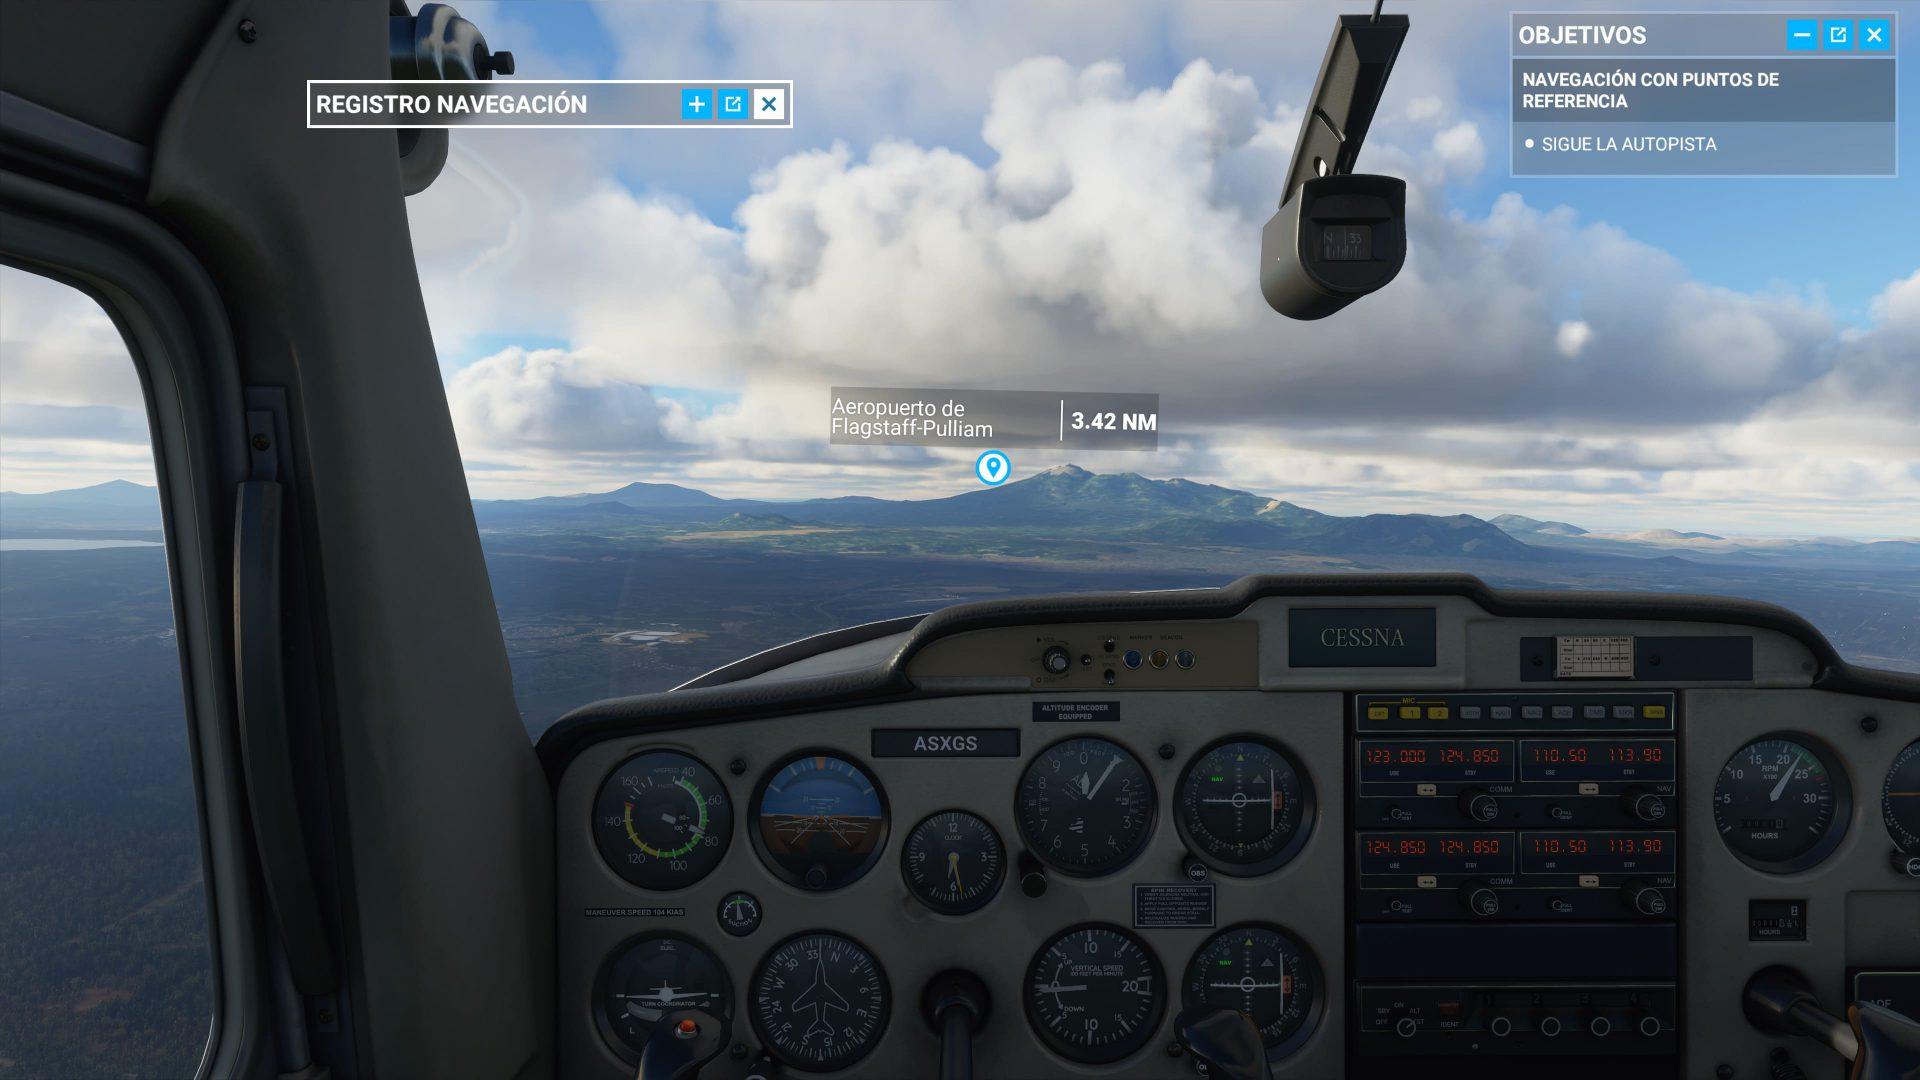 Pilotando dentro de la cabina Microsoft Flight Simulator